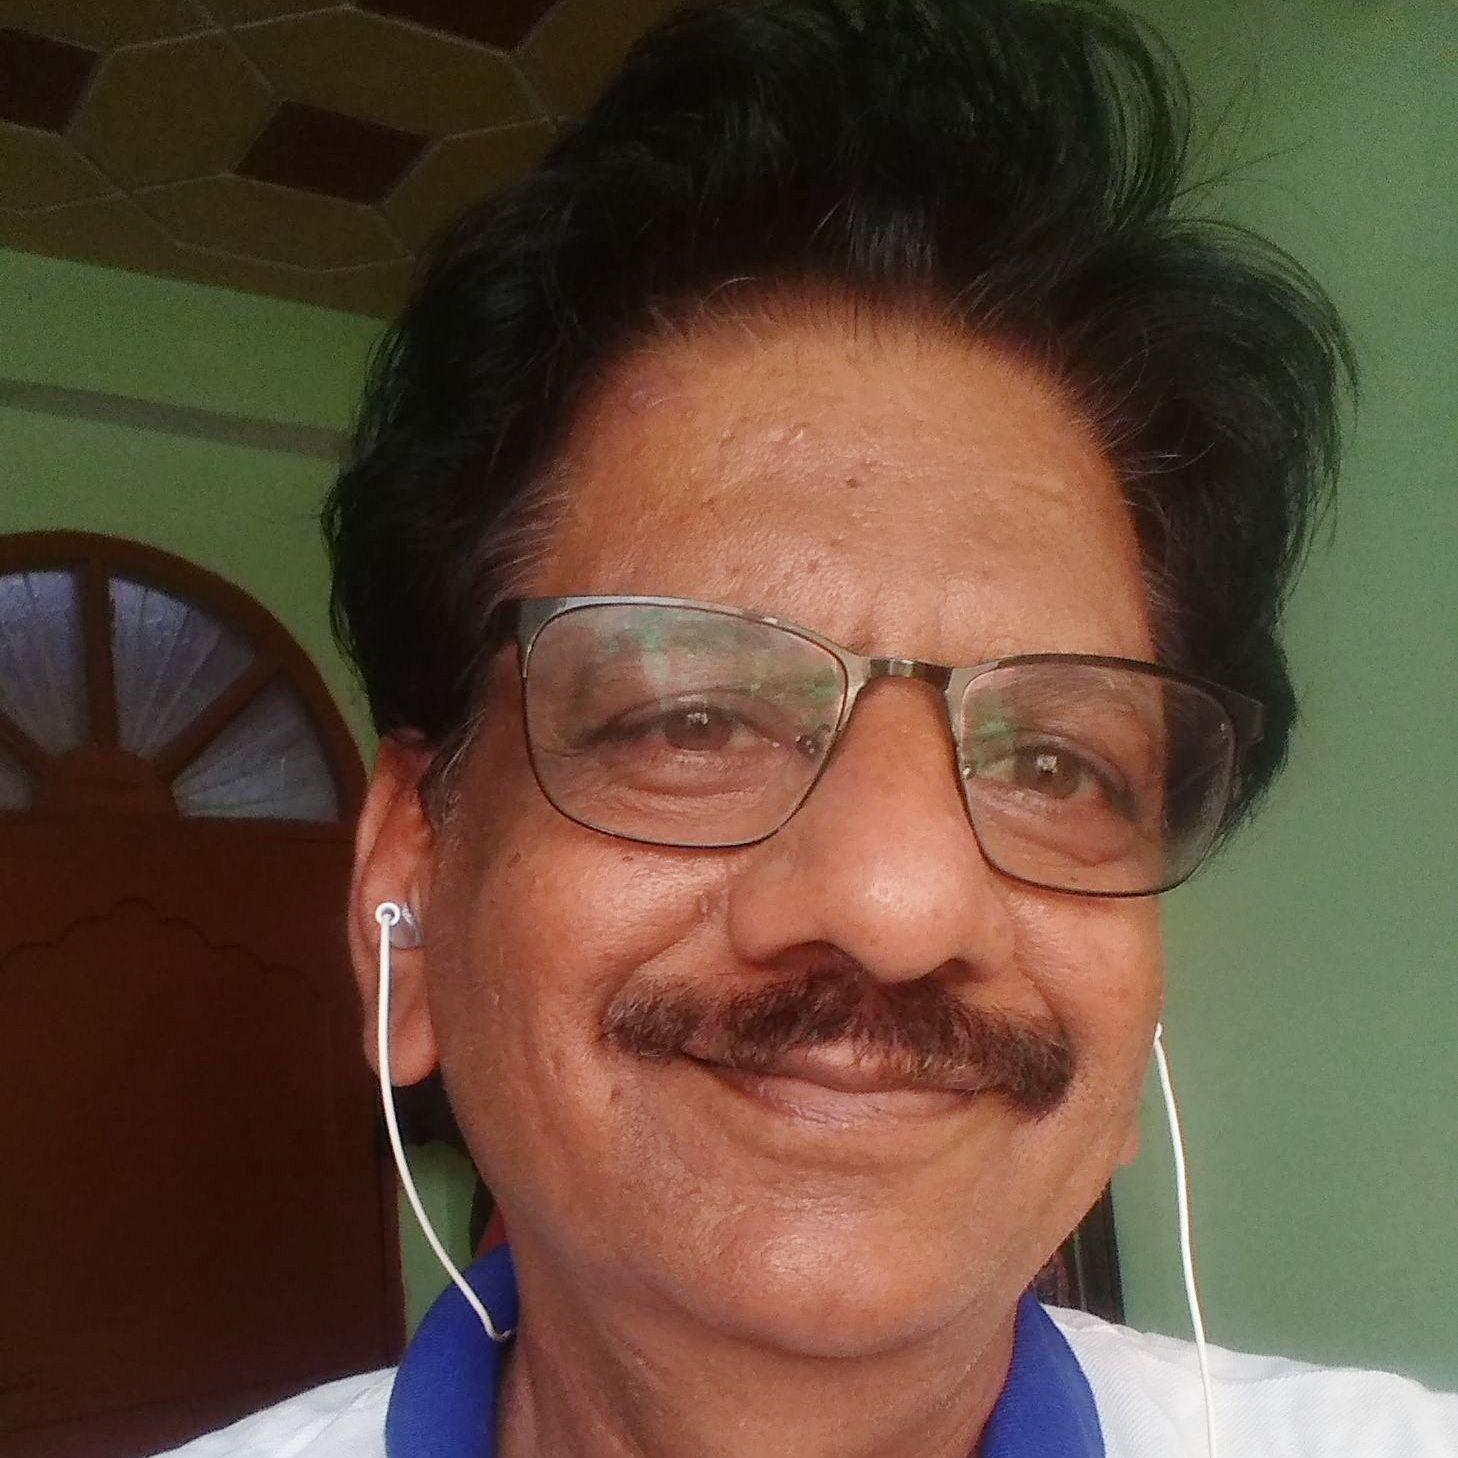 Awadhesh Saxena